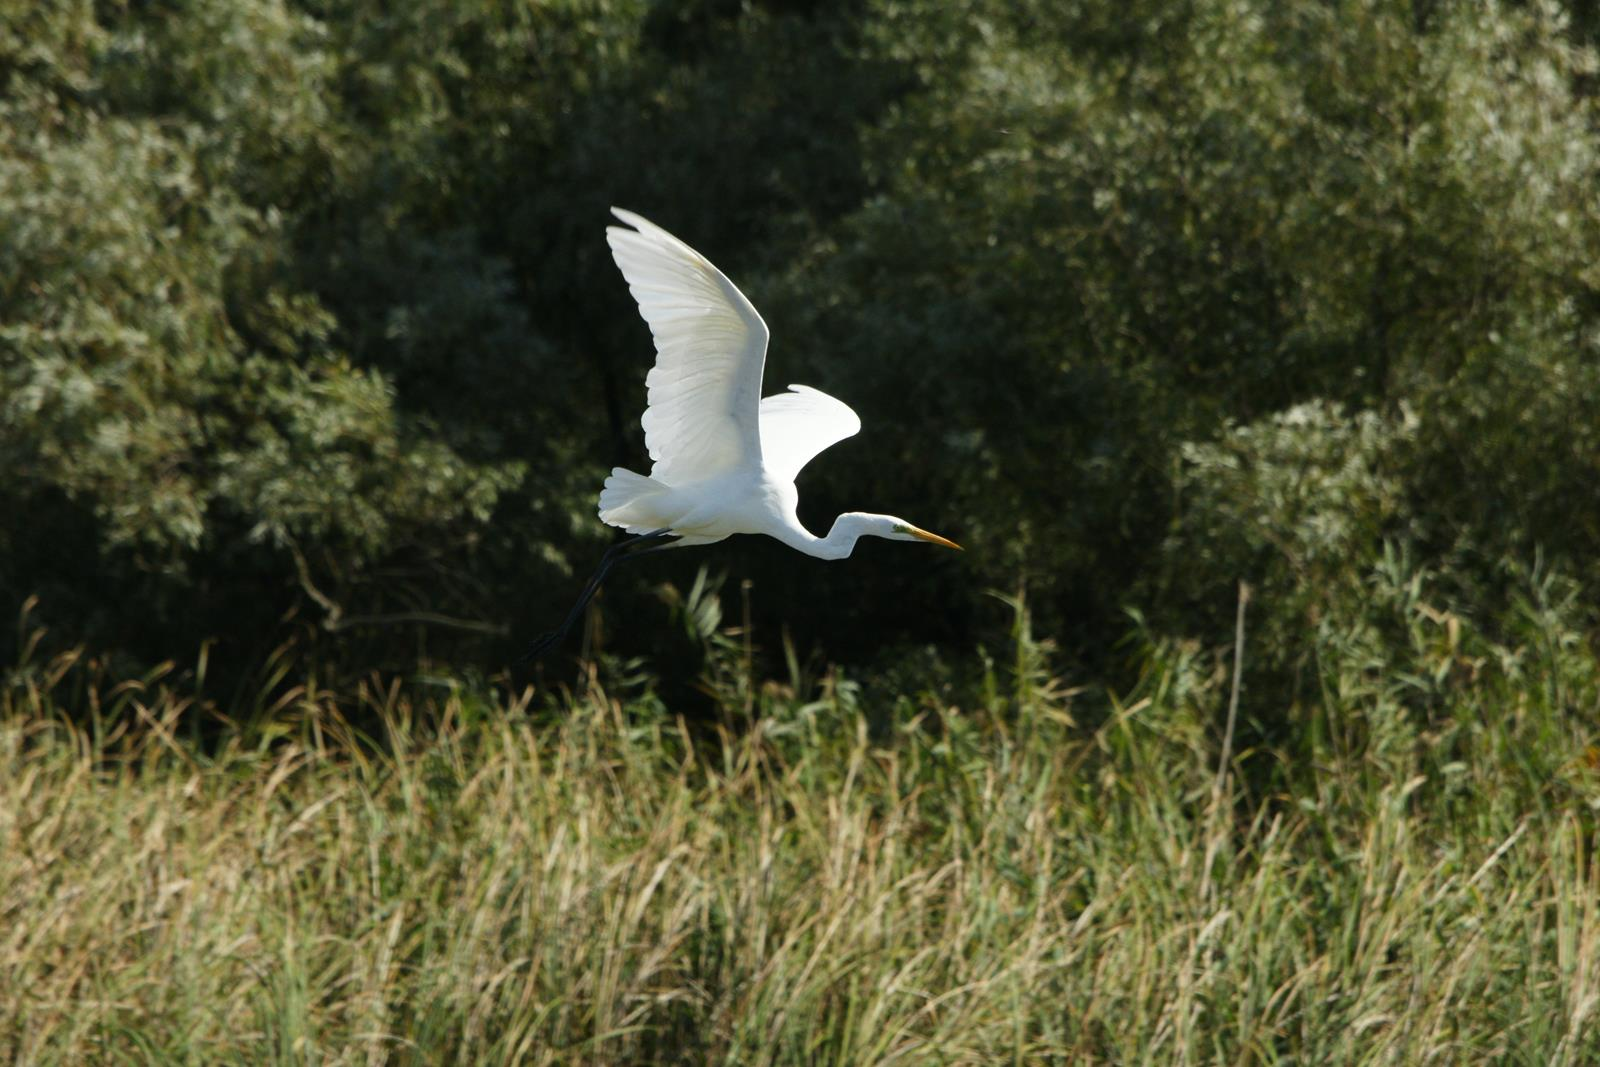 resizewildlife top foto codalbi wildlife DSC02848_1600x1067